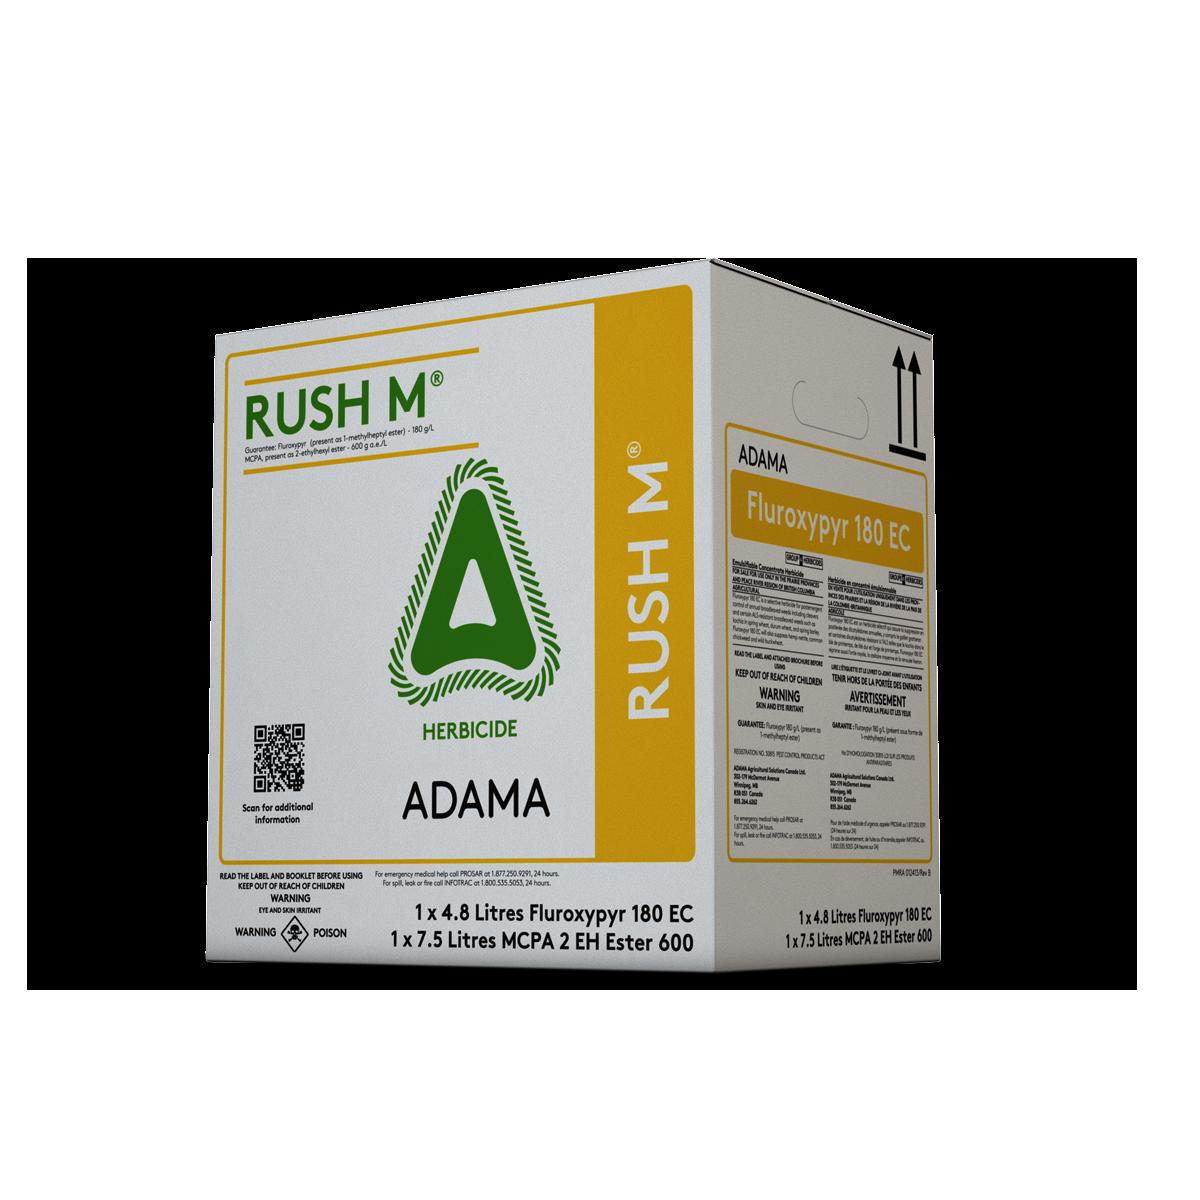 RushM[low]